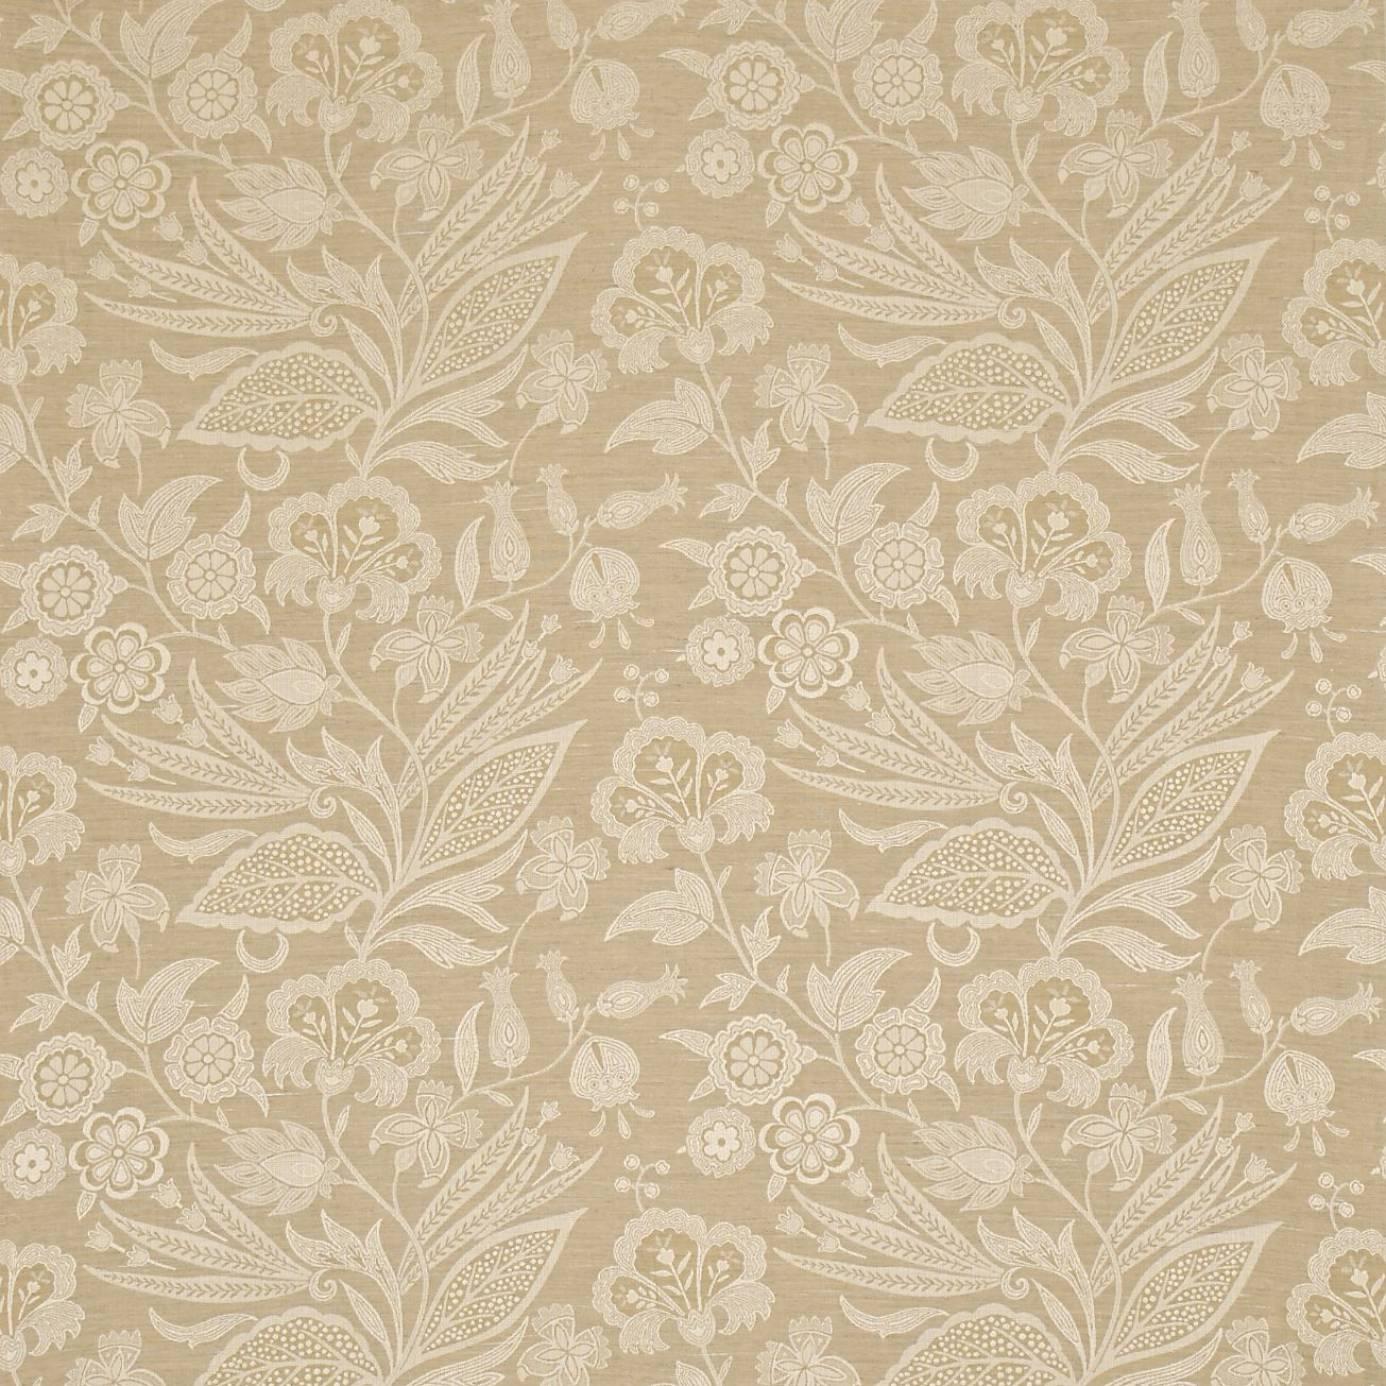 Odile Fabric - Cream/Sand (DCOROD302) - Sanderson Coralie Fabrics ...